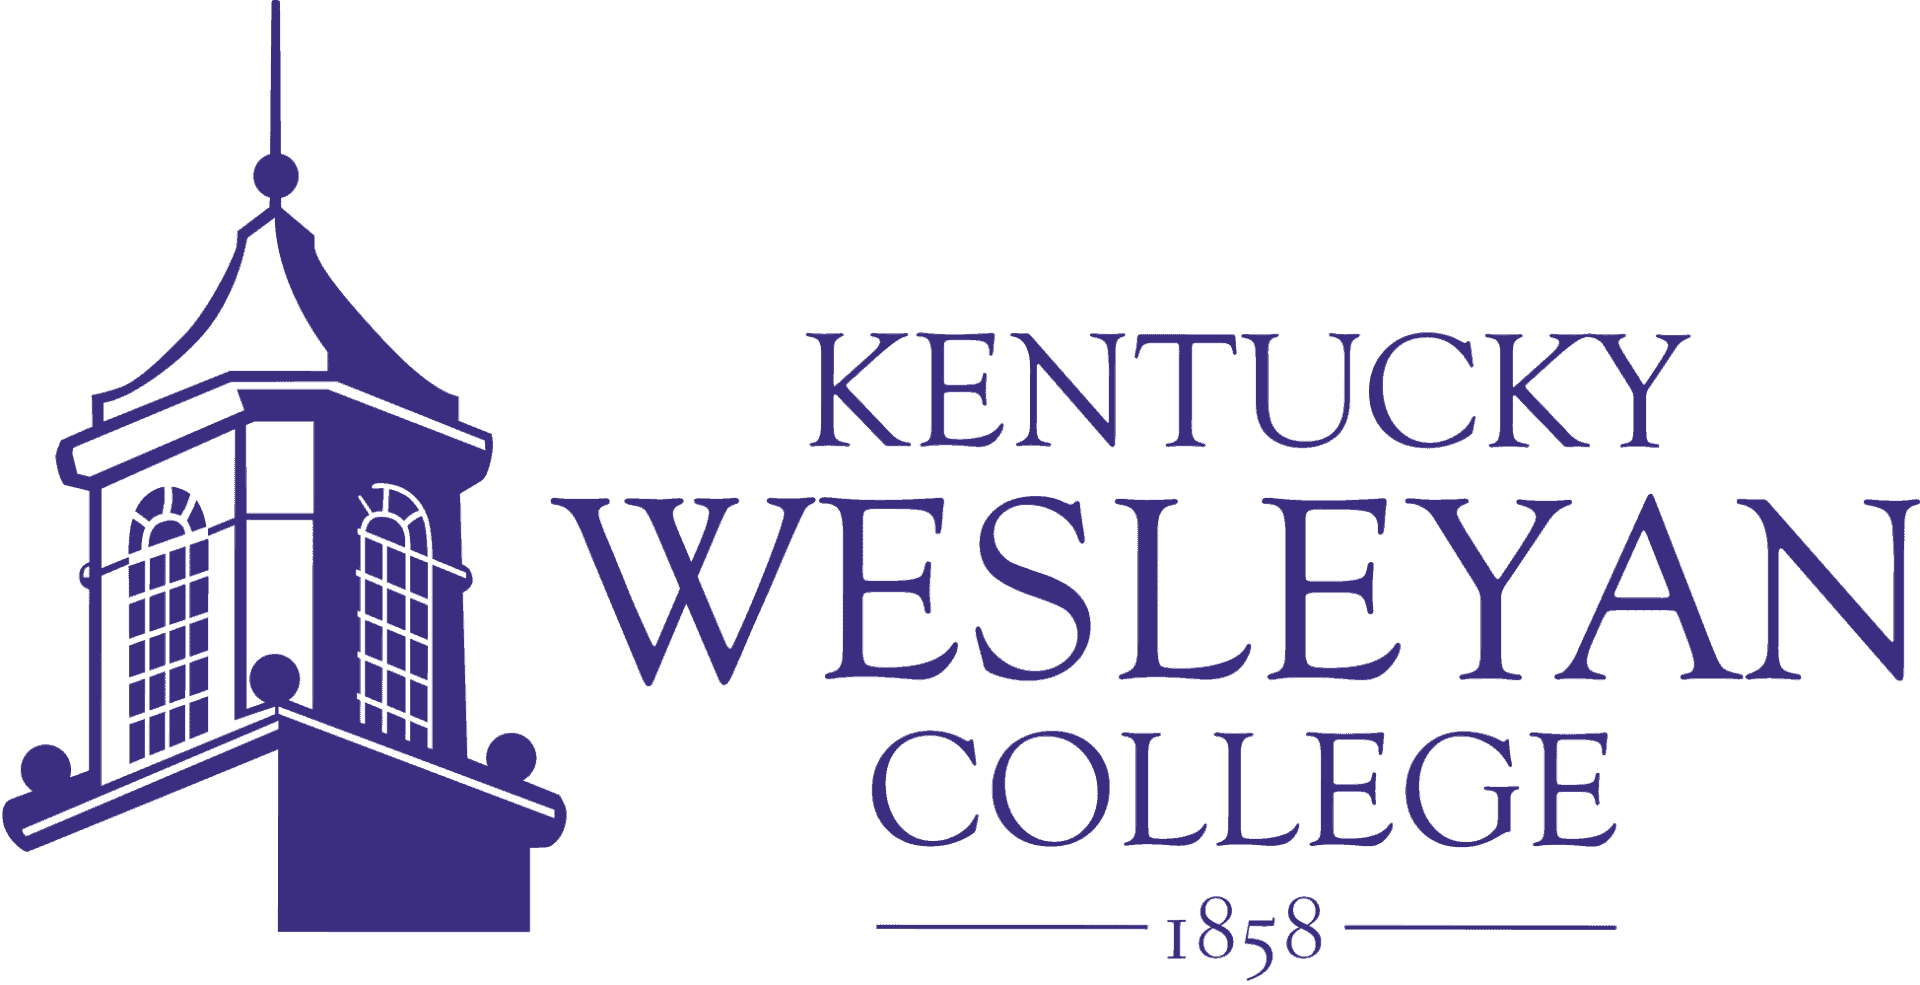 kentucky wesleyan college logo 7033